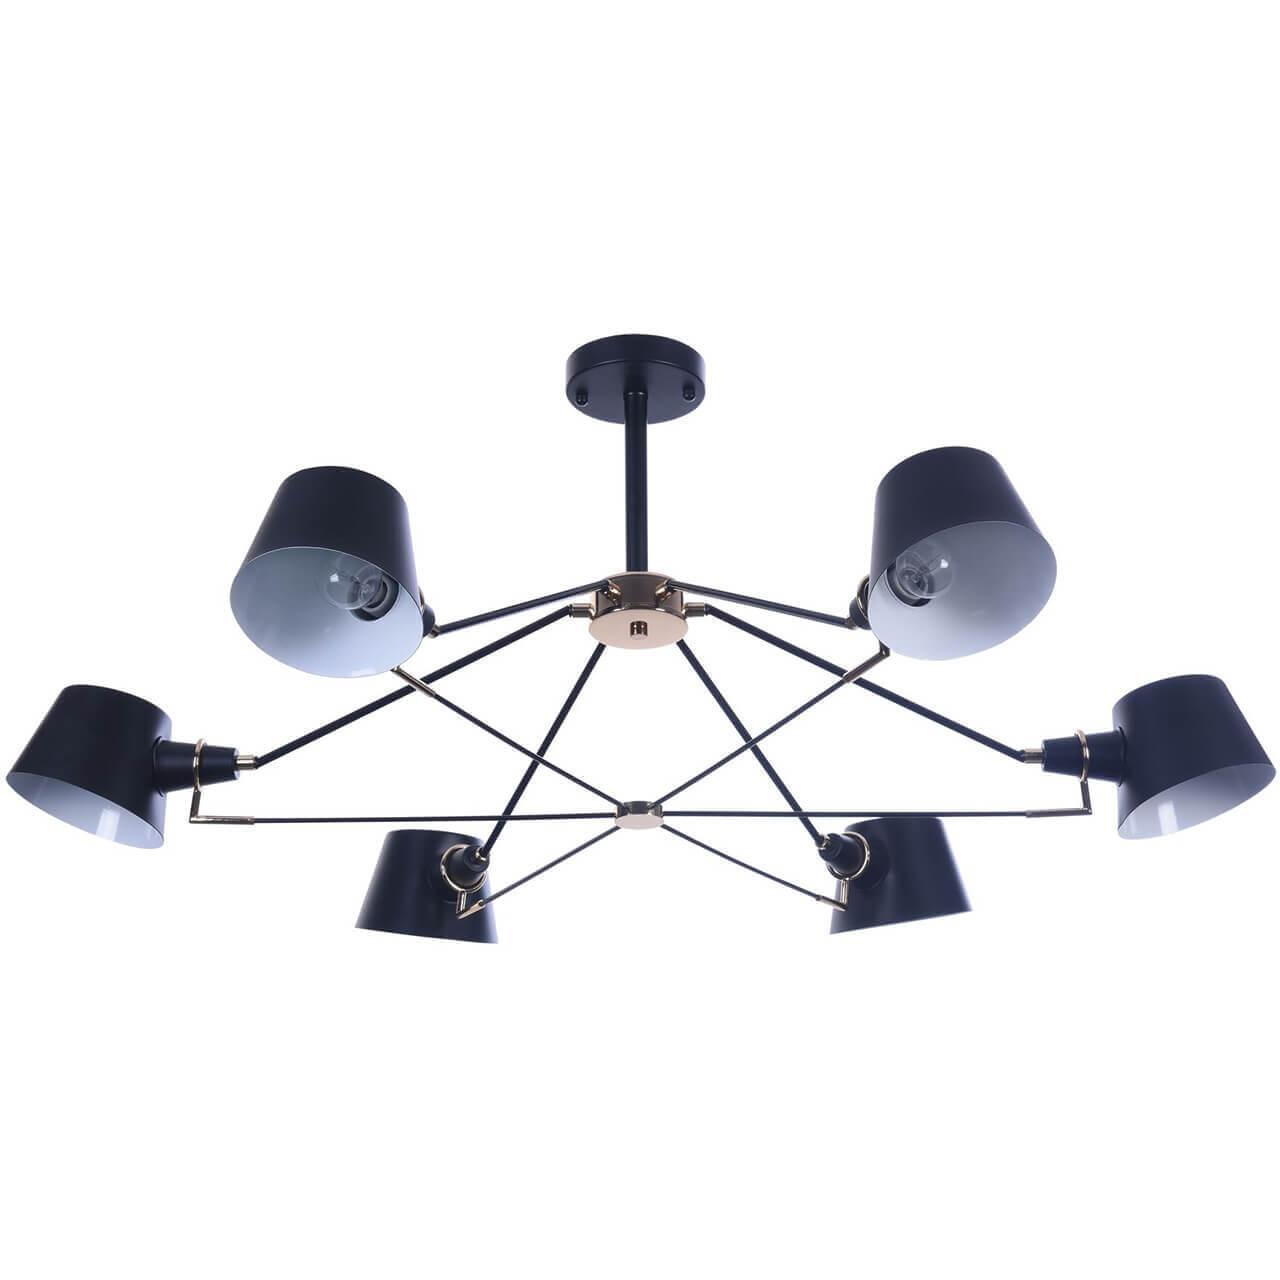 Потолочный светильник Freya FR5038-CL-06-B, E14, 40 Вт бра abigail fr5038 wl 01 b